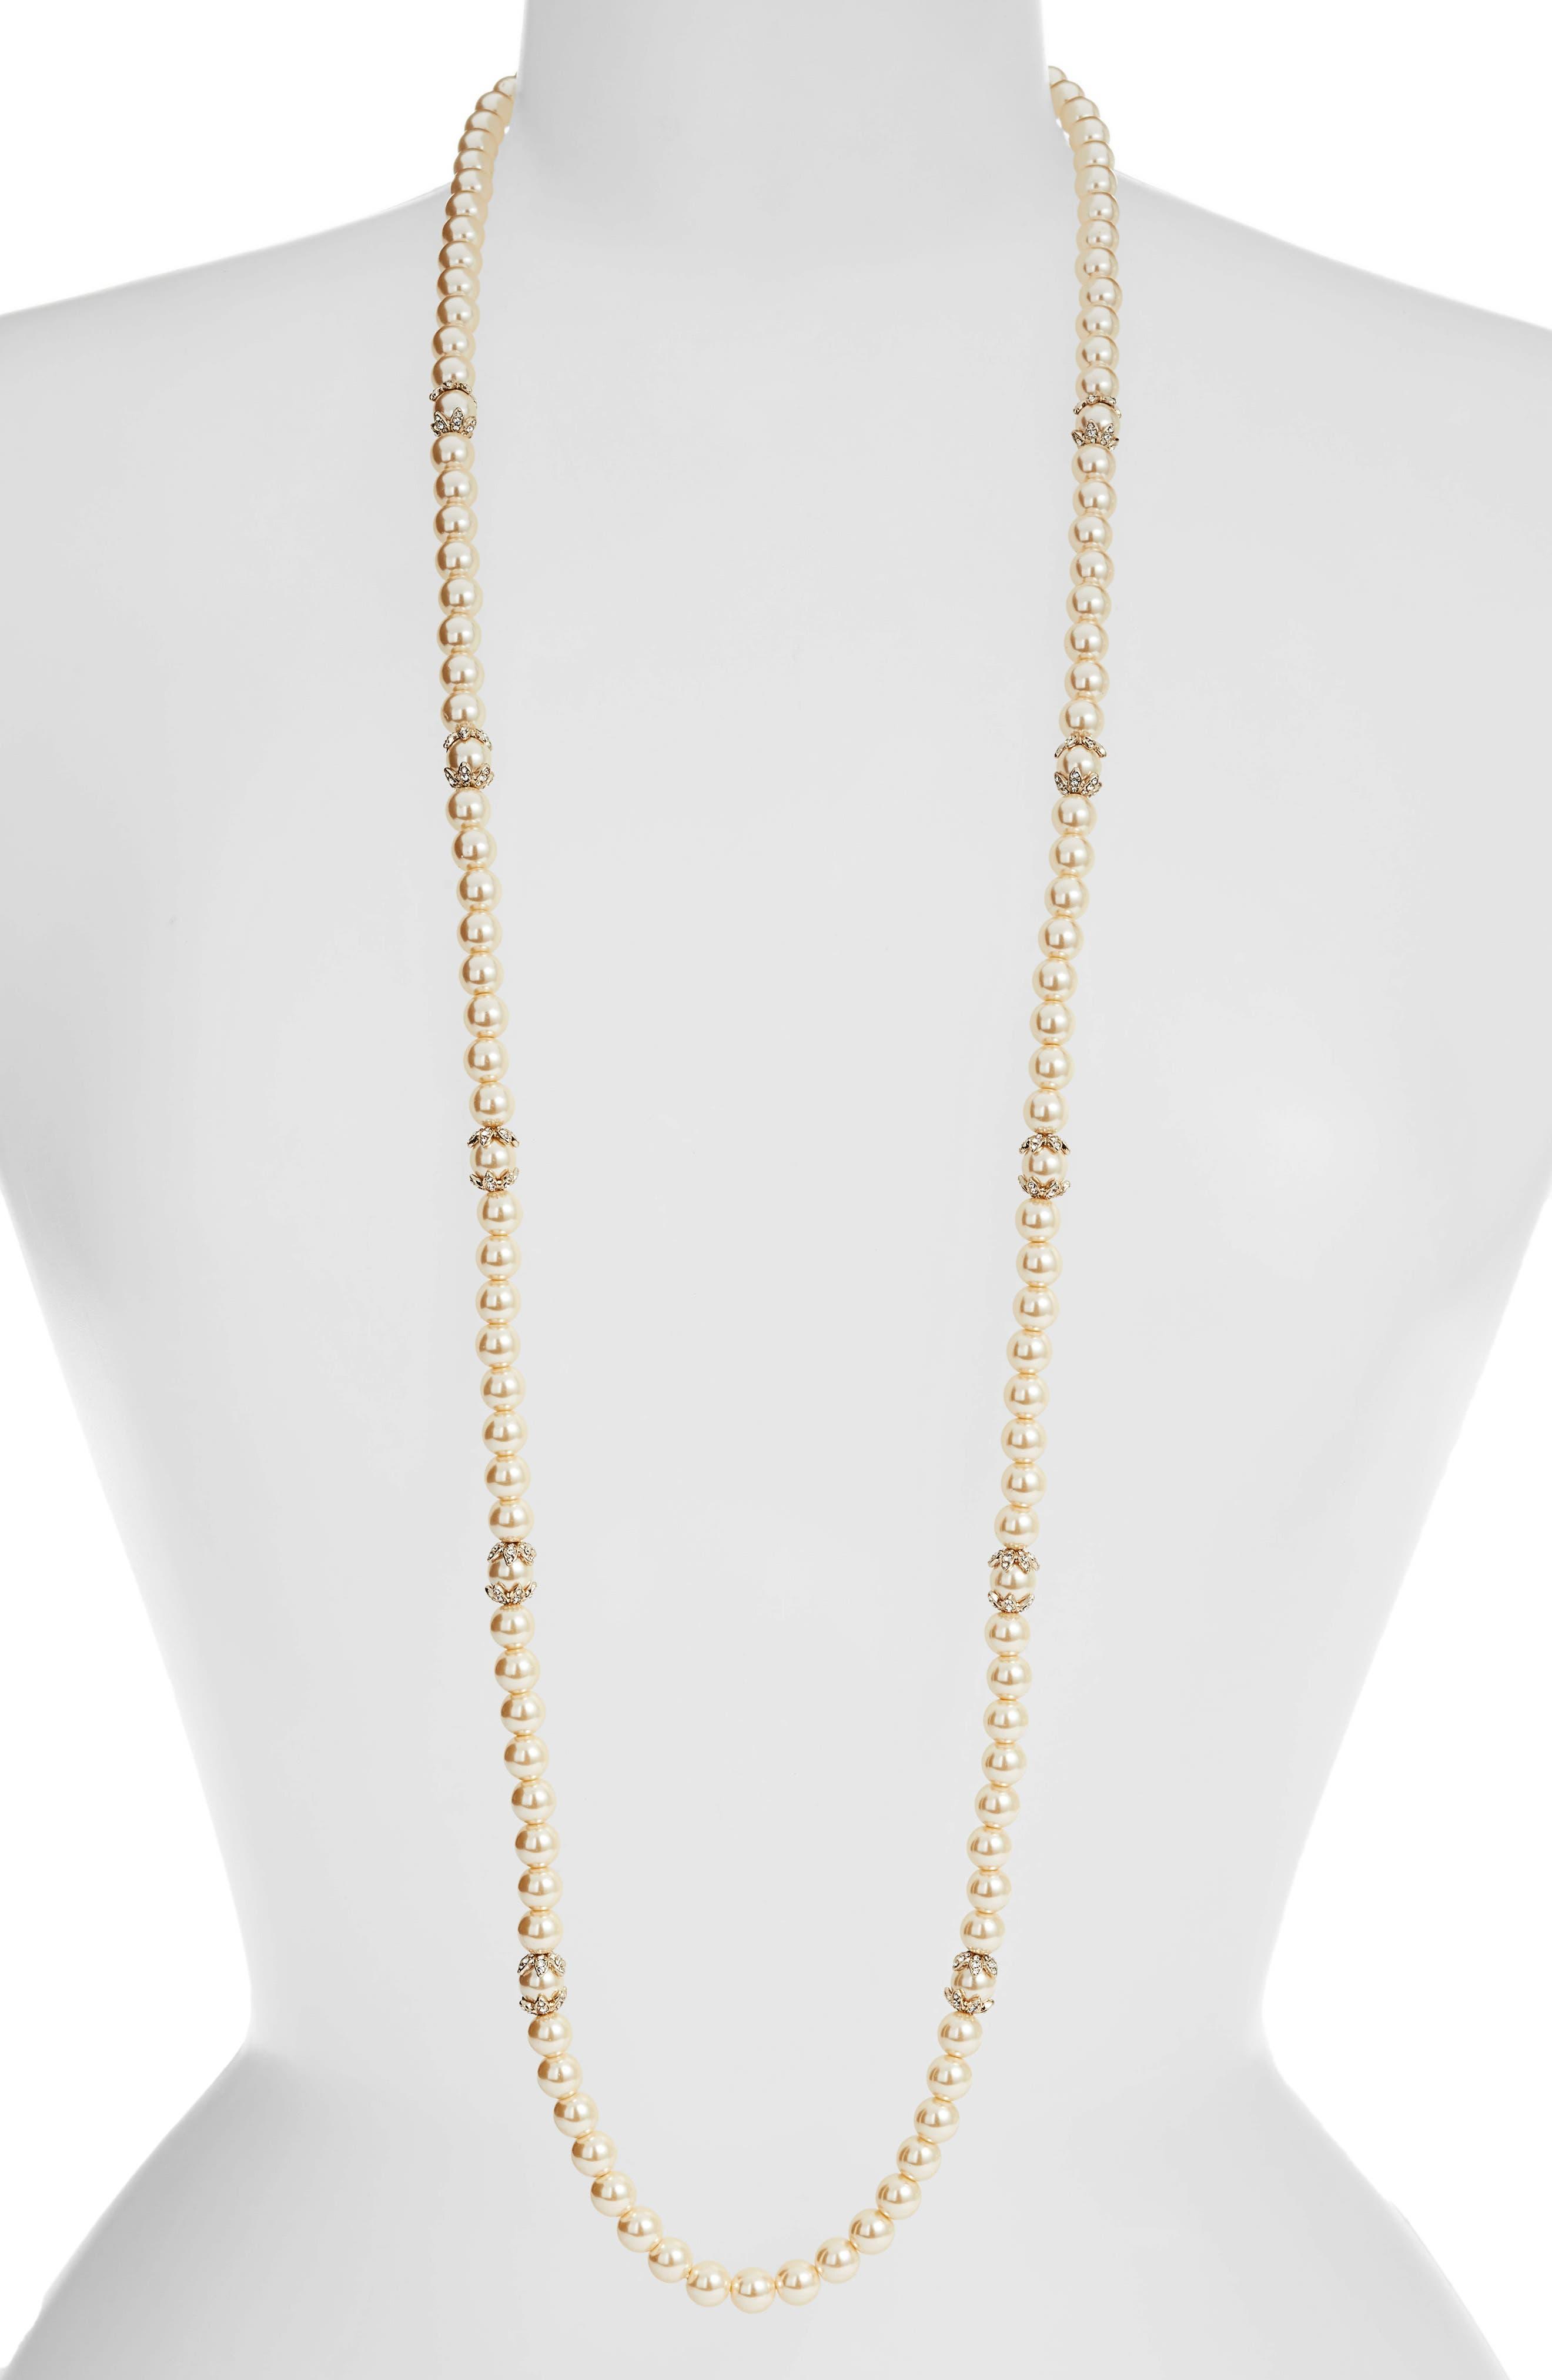 MARCHESA, Long Imitation Pearl Strand Necklace, Main thumbnail 1, color, BLUSH/ GOLD